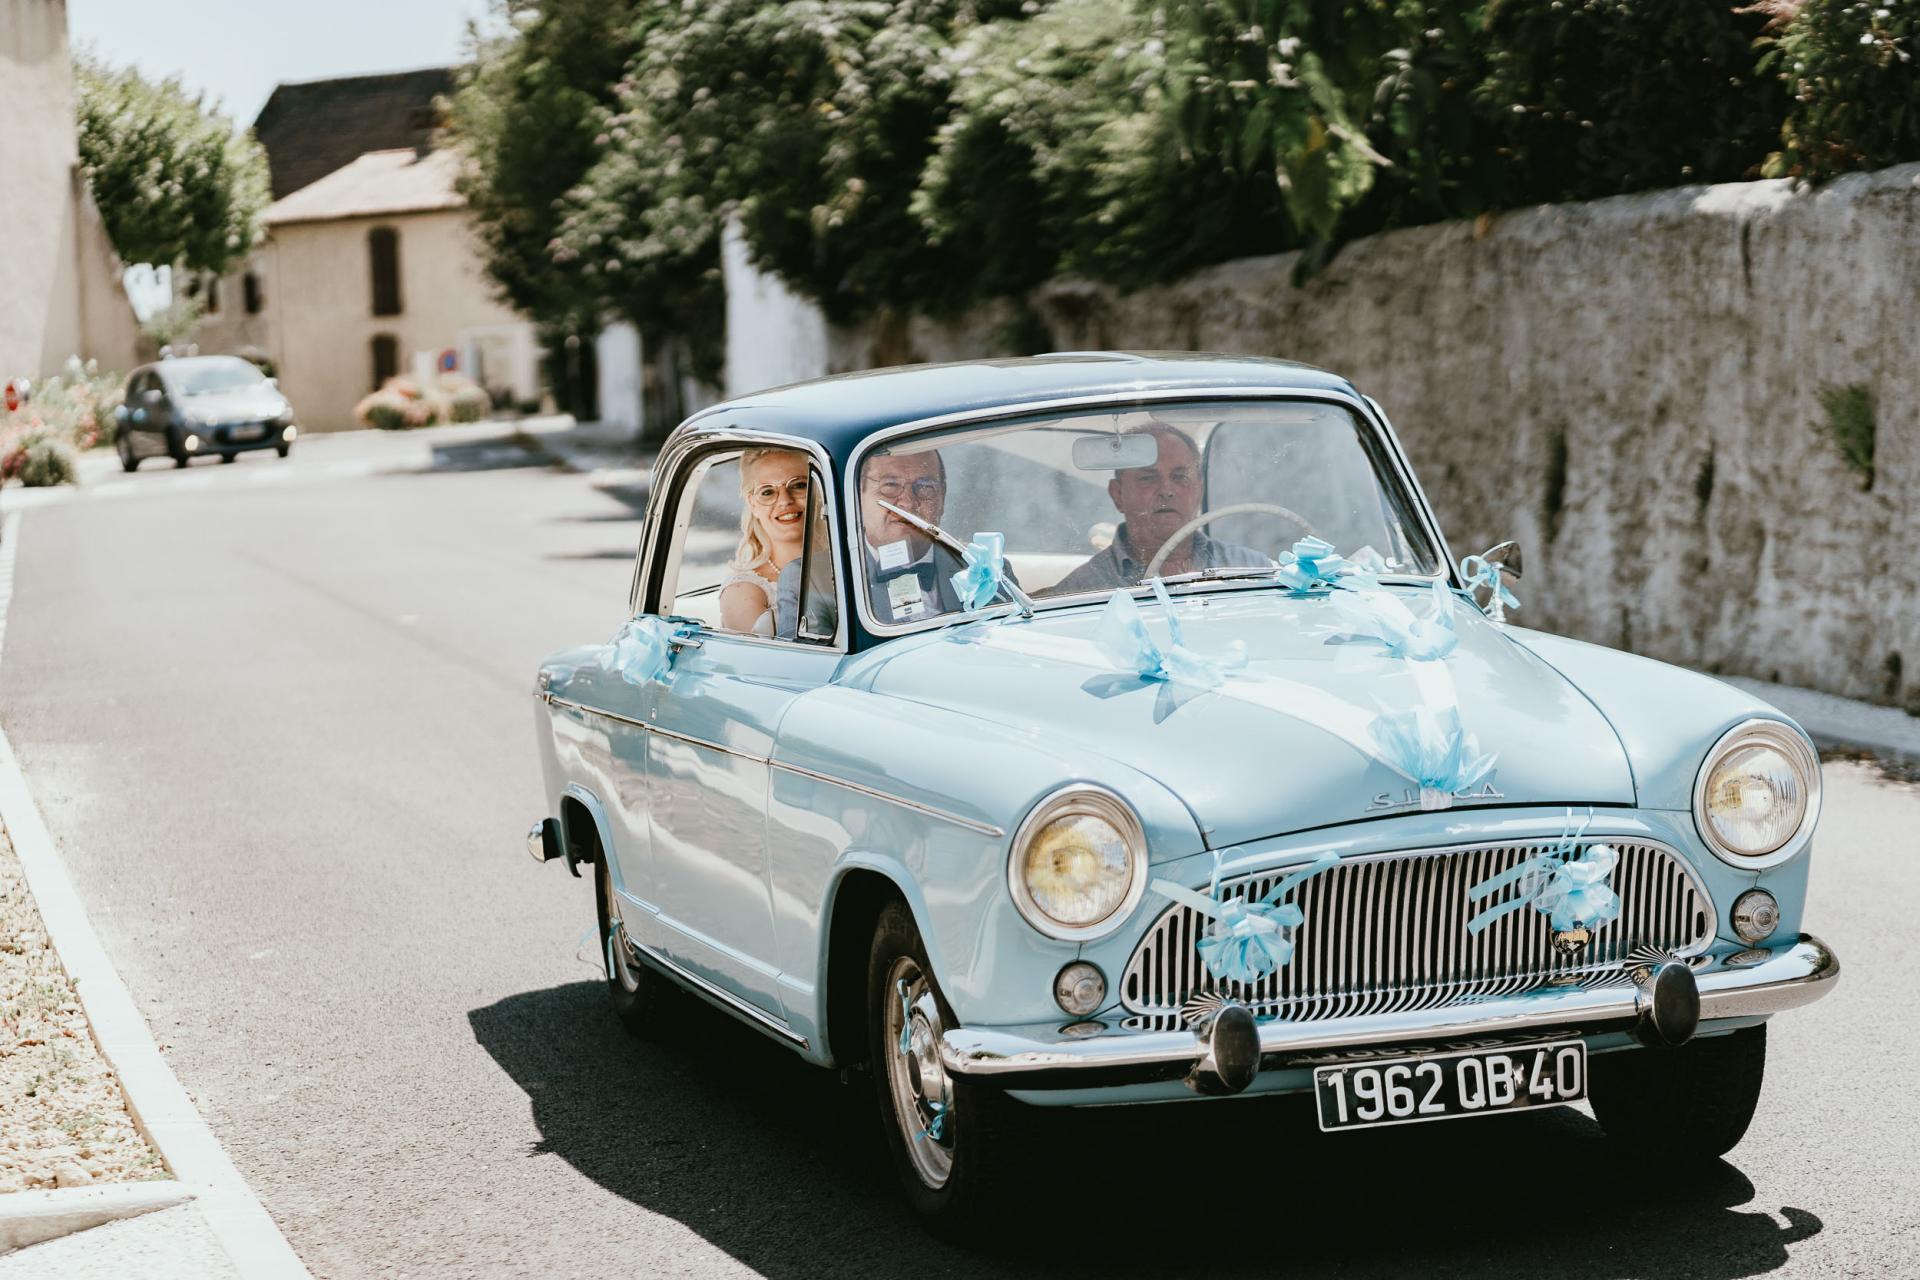 Photographe de mariage moody boho chic boheme dax landes aquitaine fineart 4